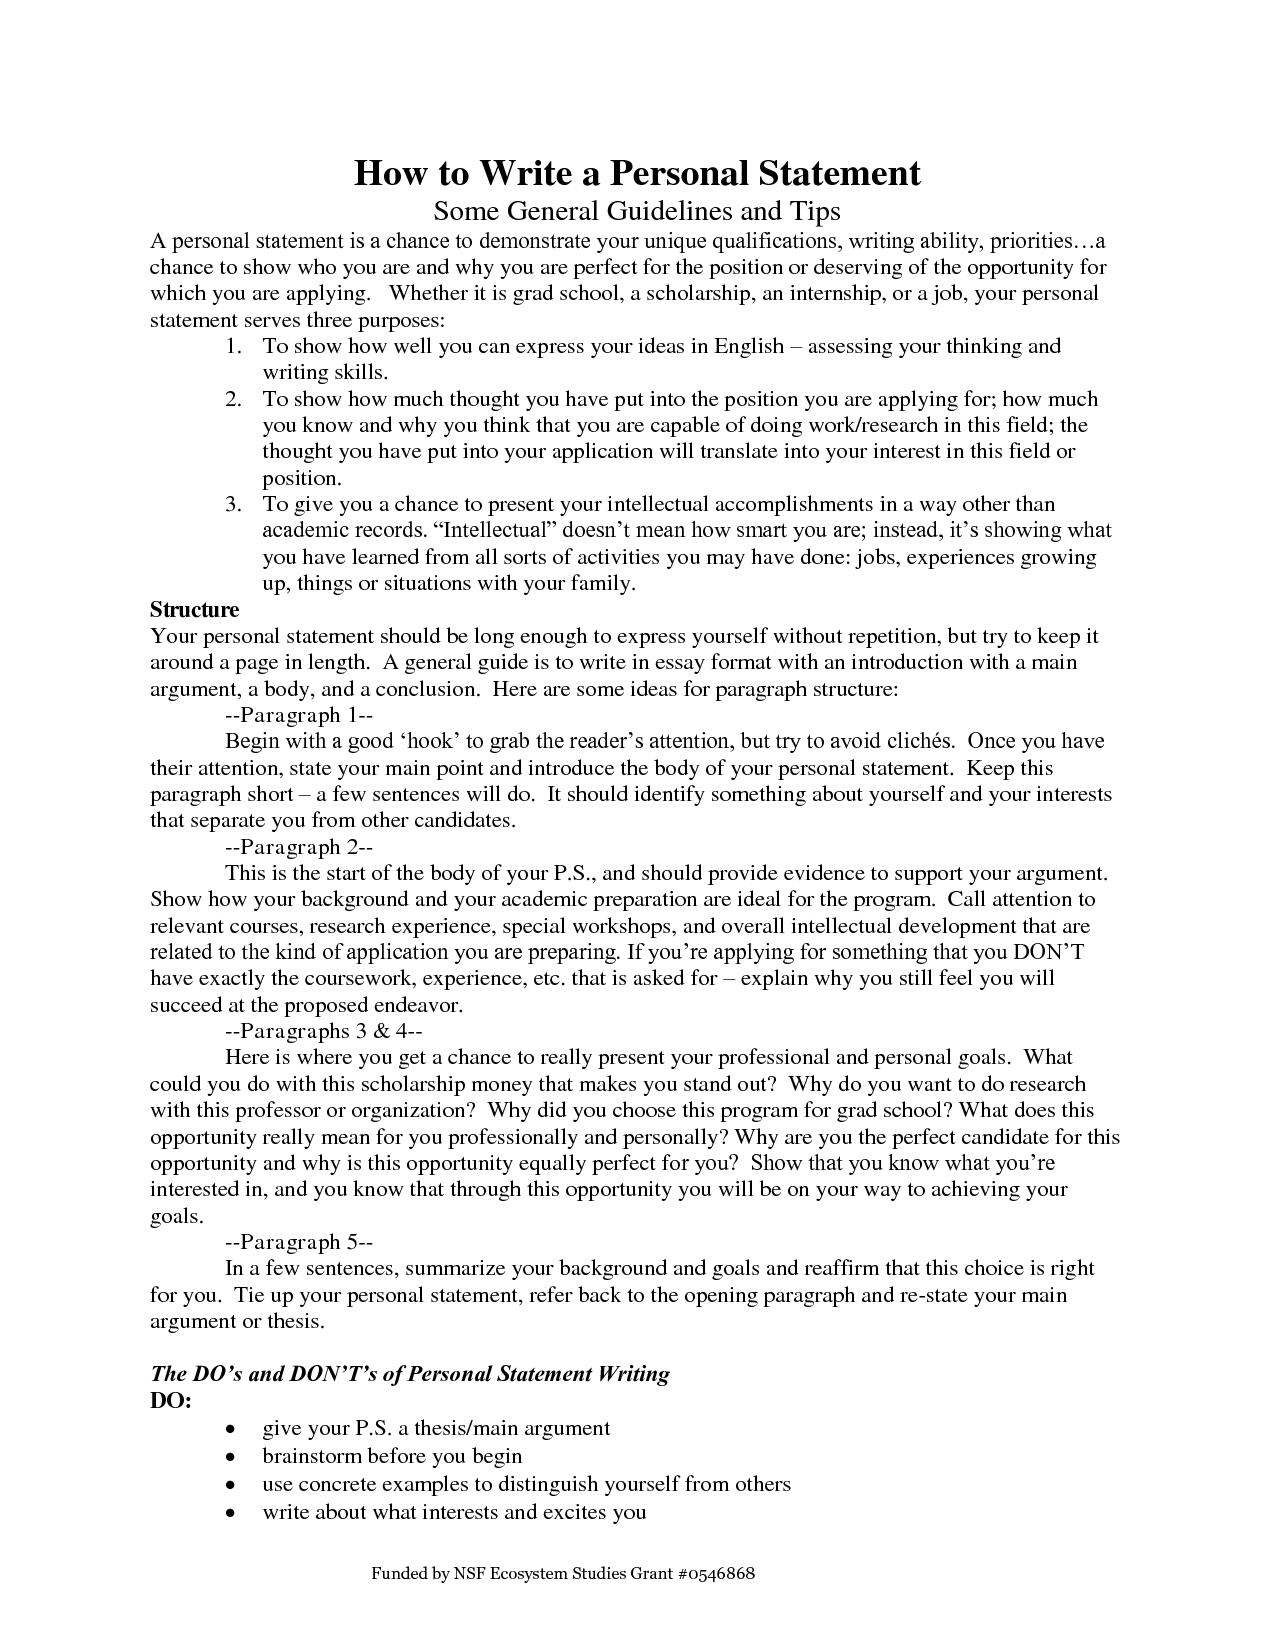 Writing Personal Statement